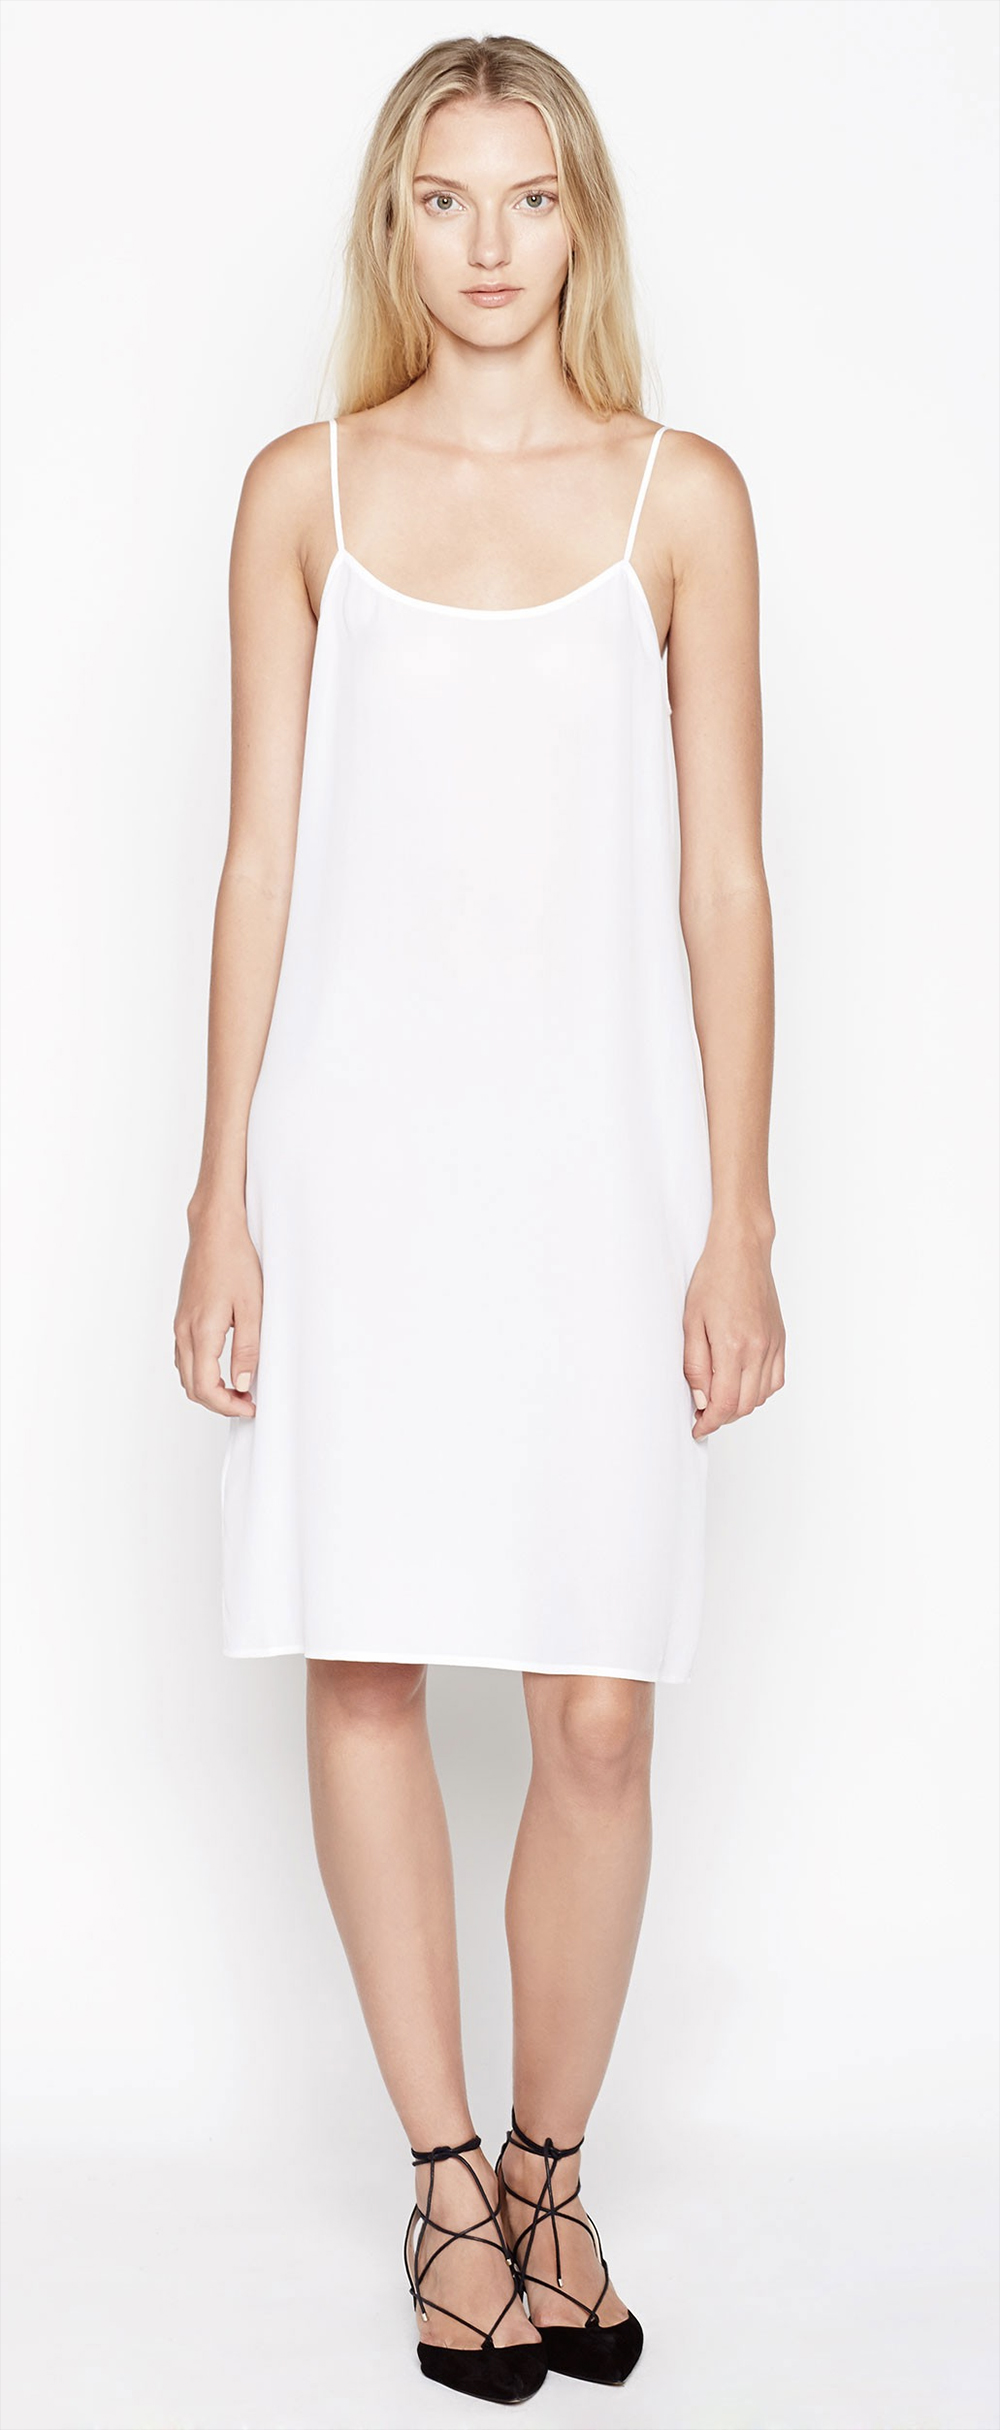 one slip dress